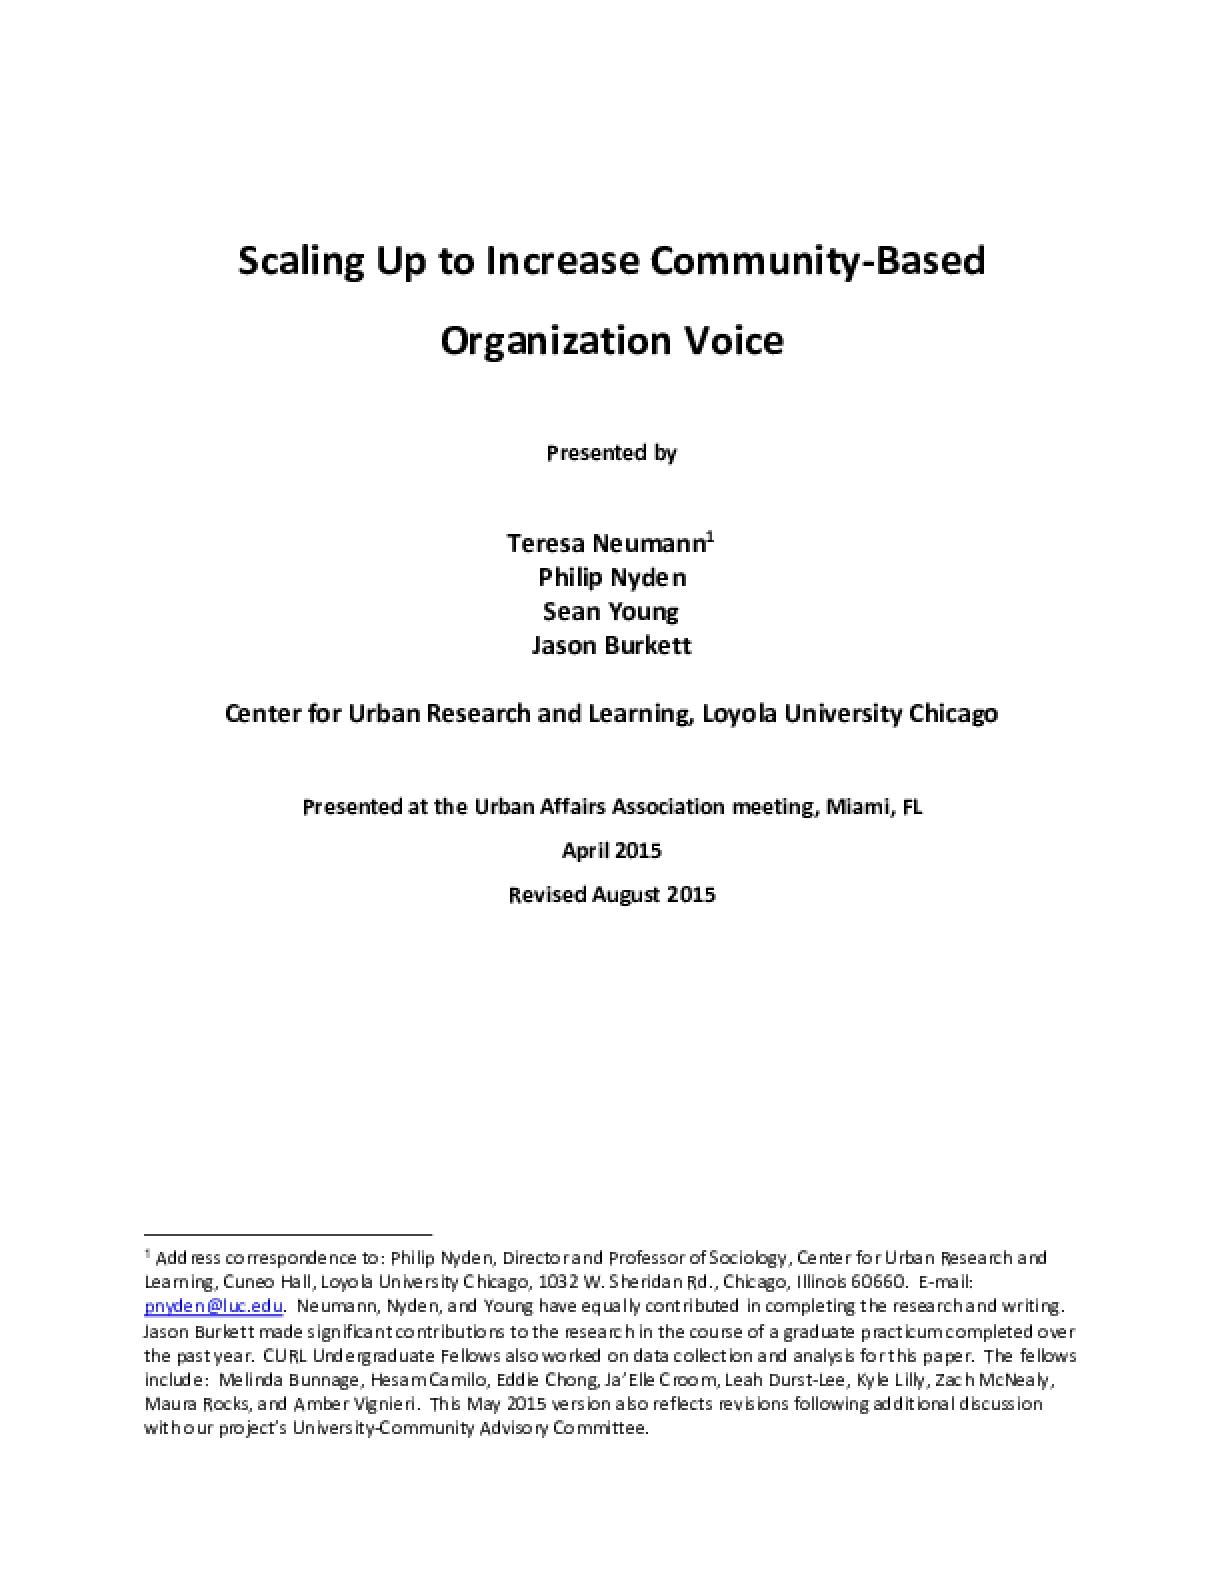 Scaling Up to Increase Community-Based Organization Voice